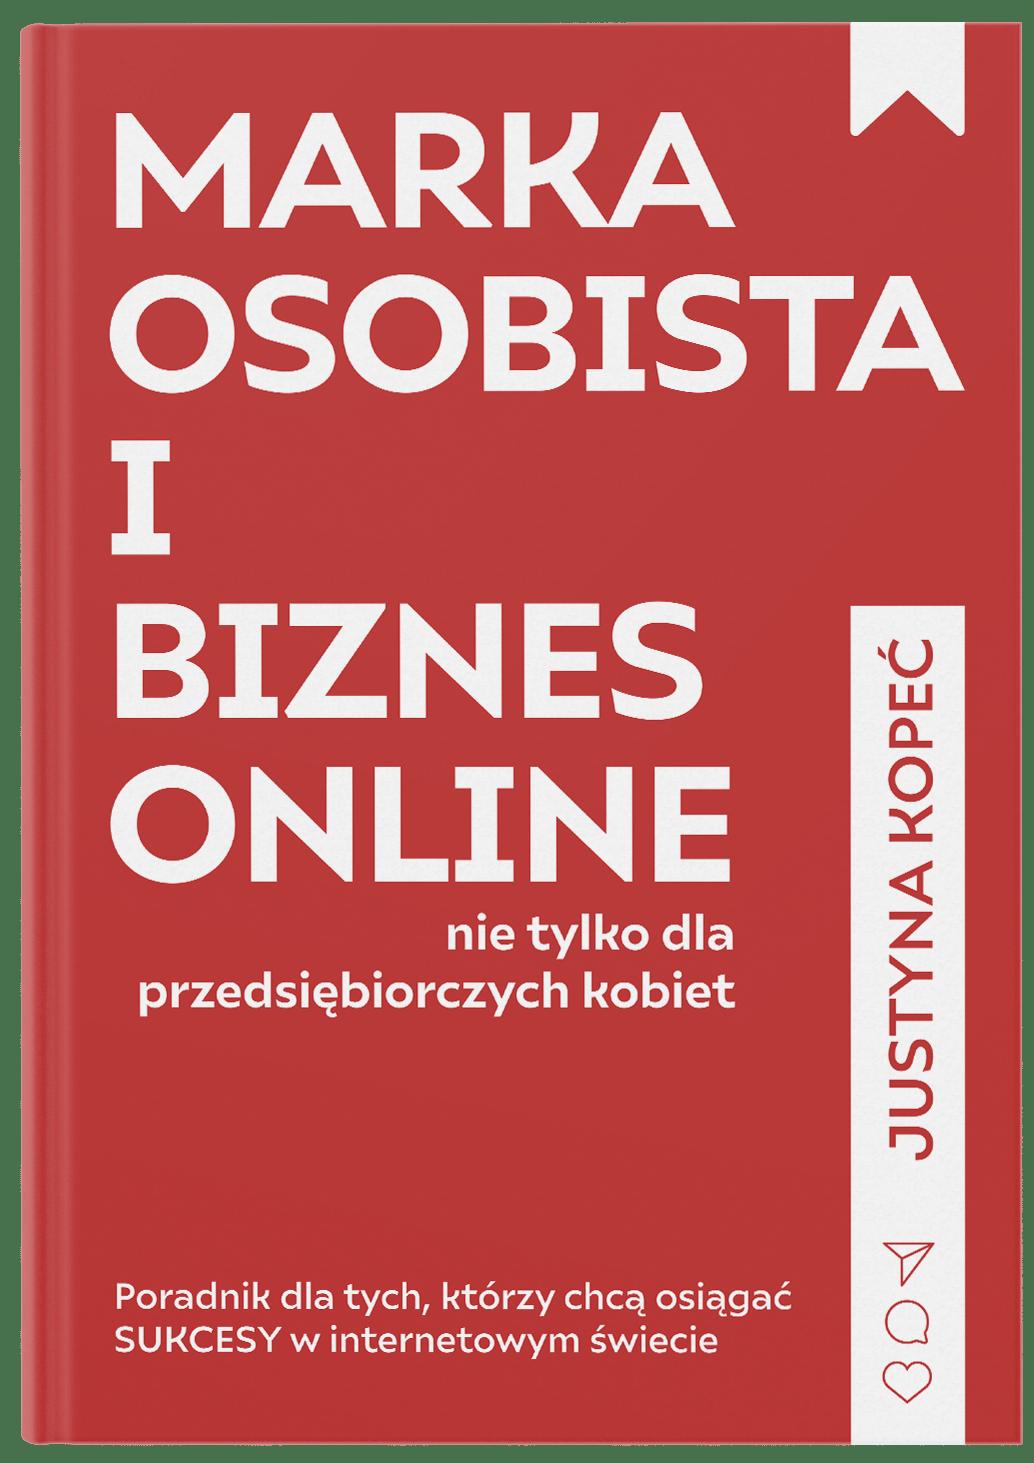 Marka osobista ibiznes online Justyna Kopeć